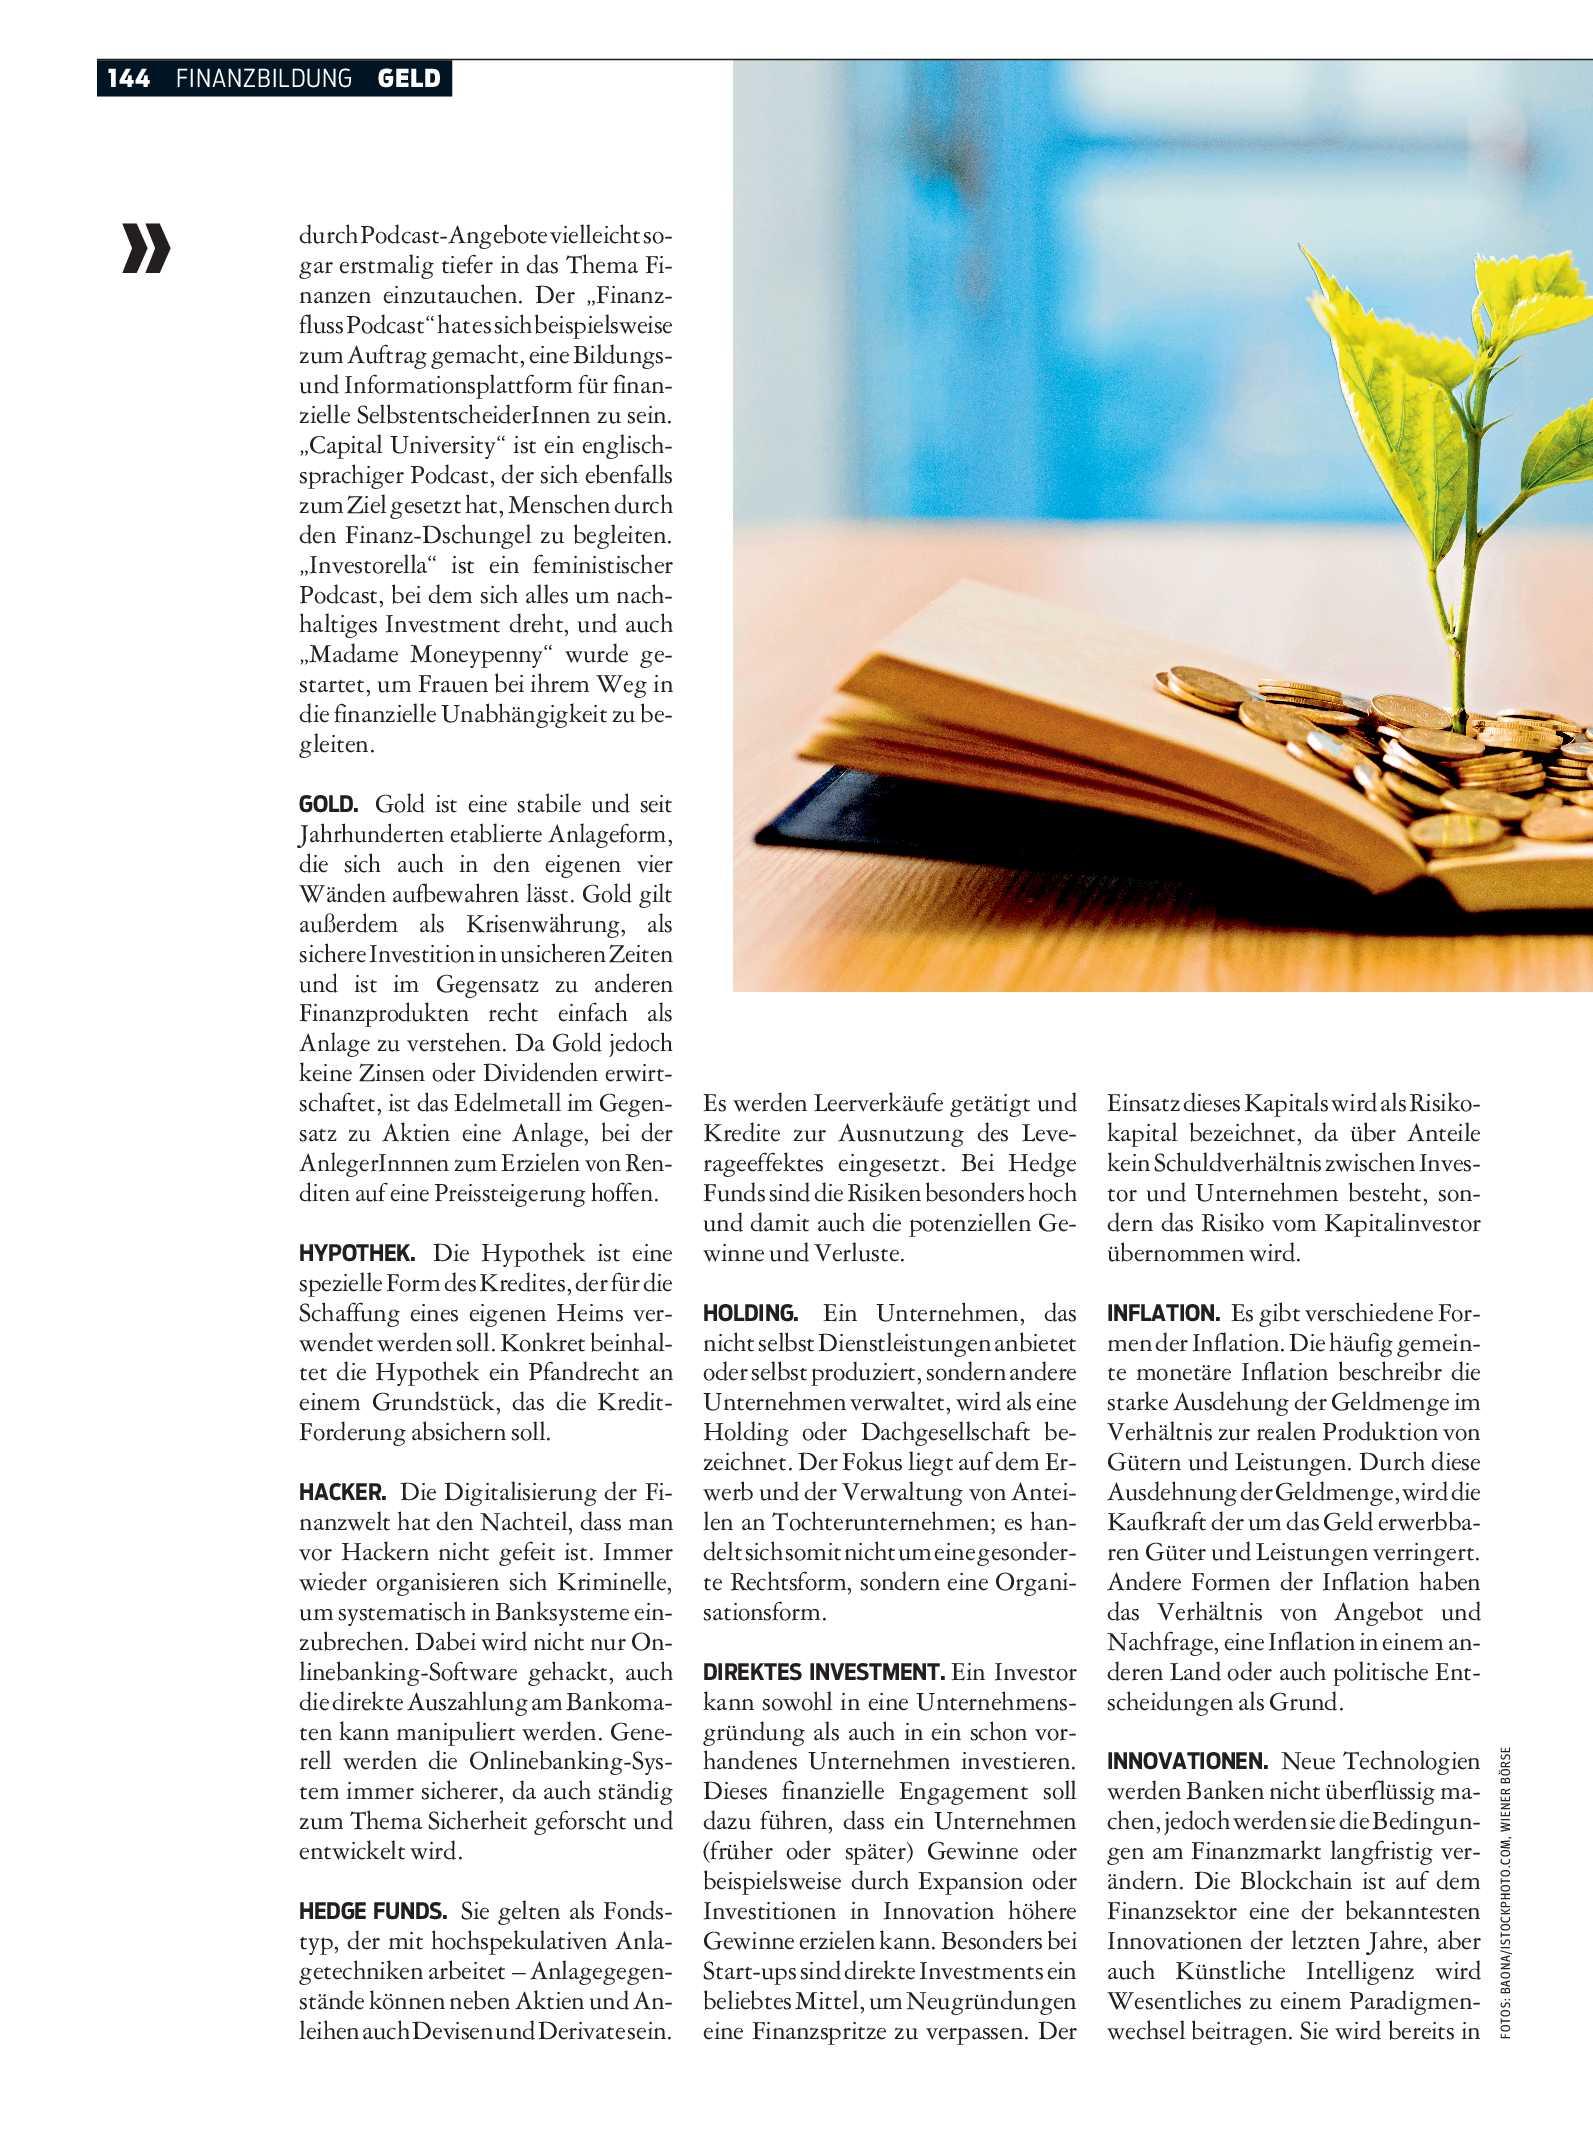 public/epaper/imported/20201118/kurier/magazin/magazin_20201118_144.jpg